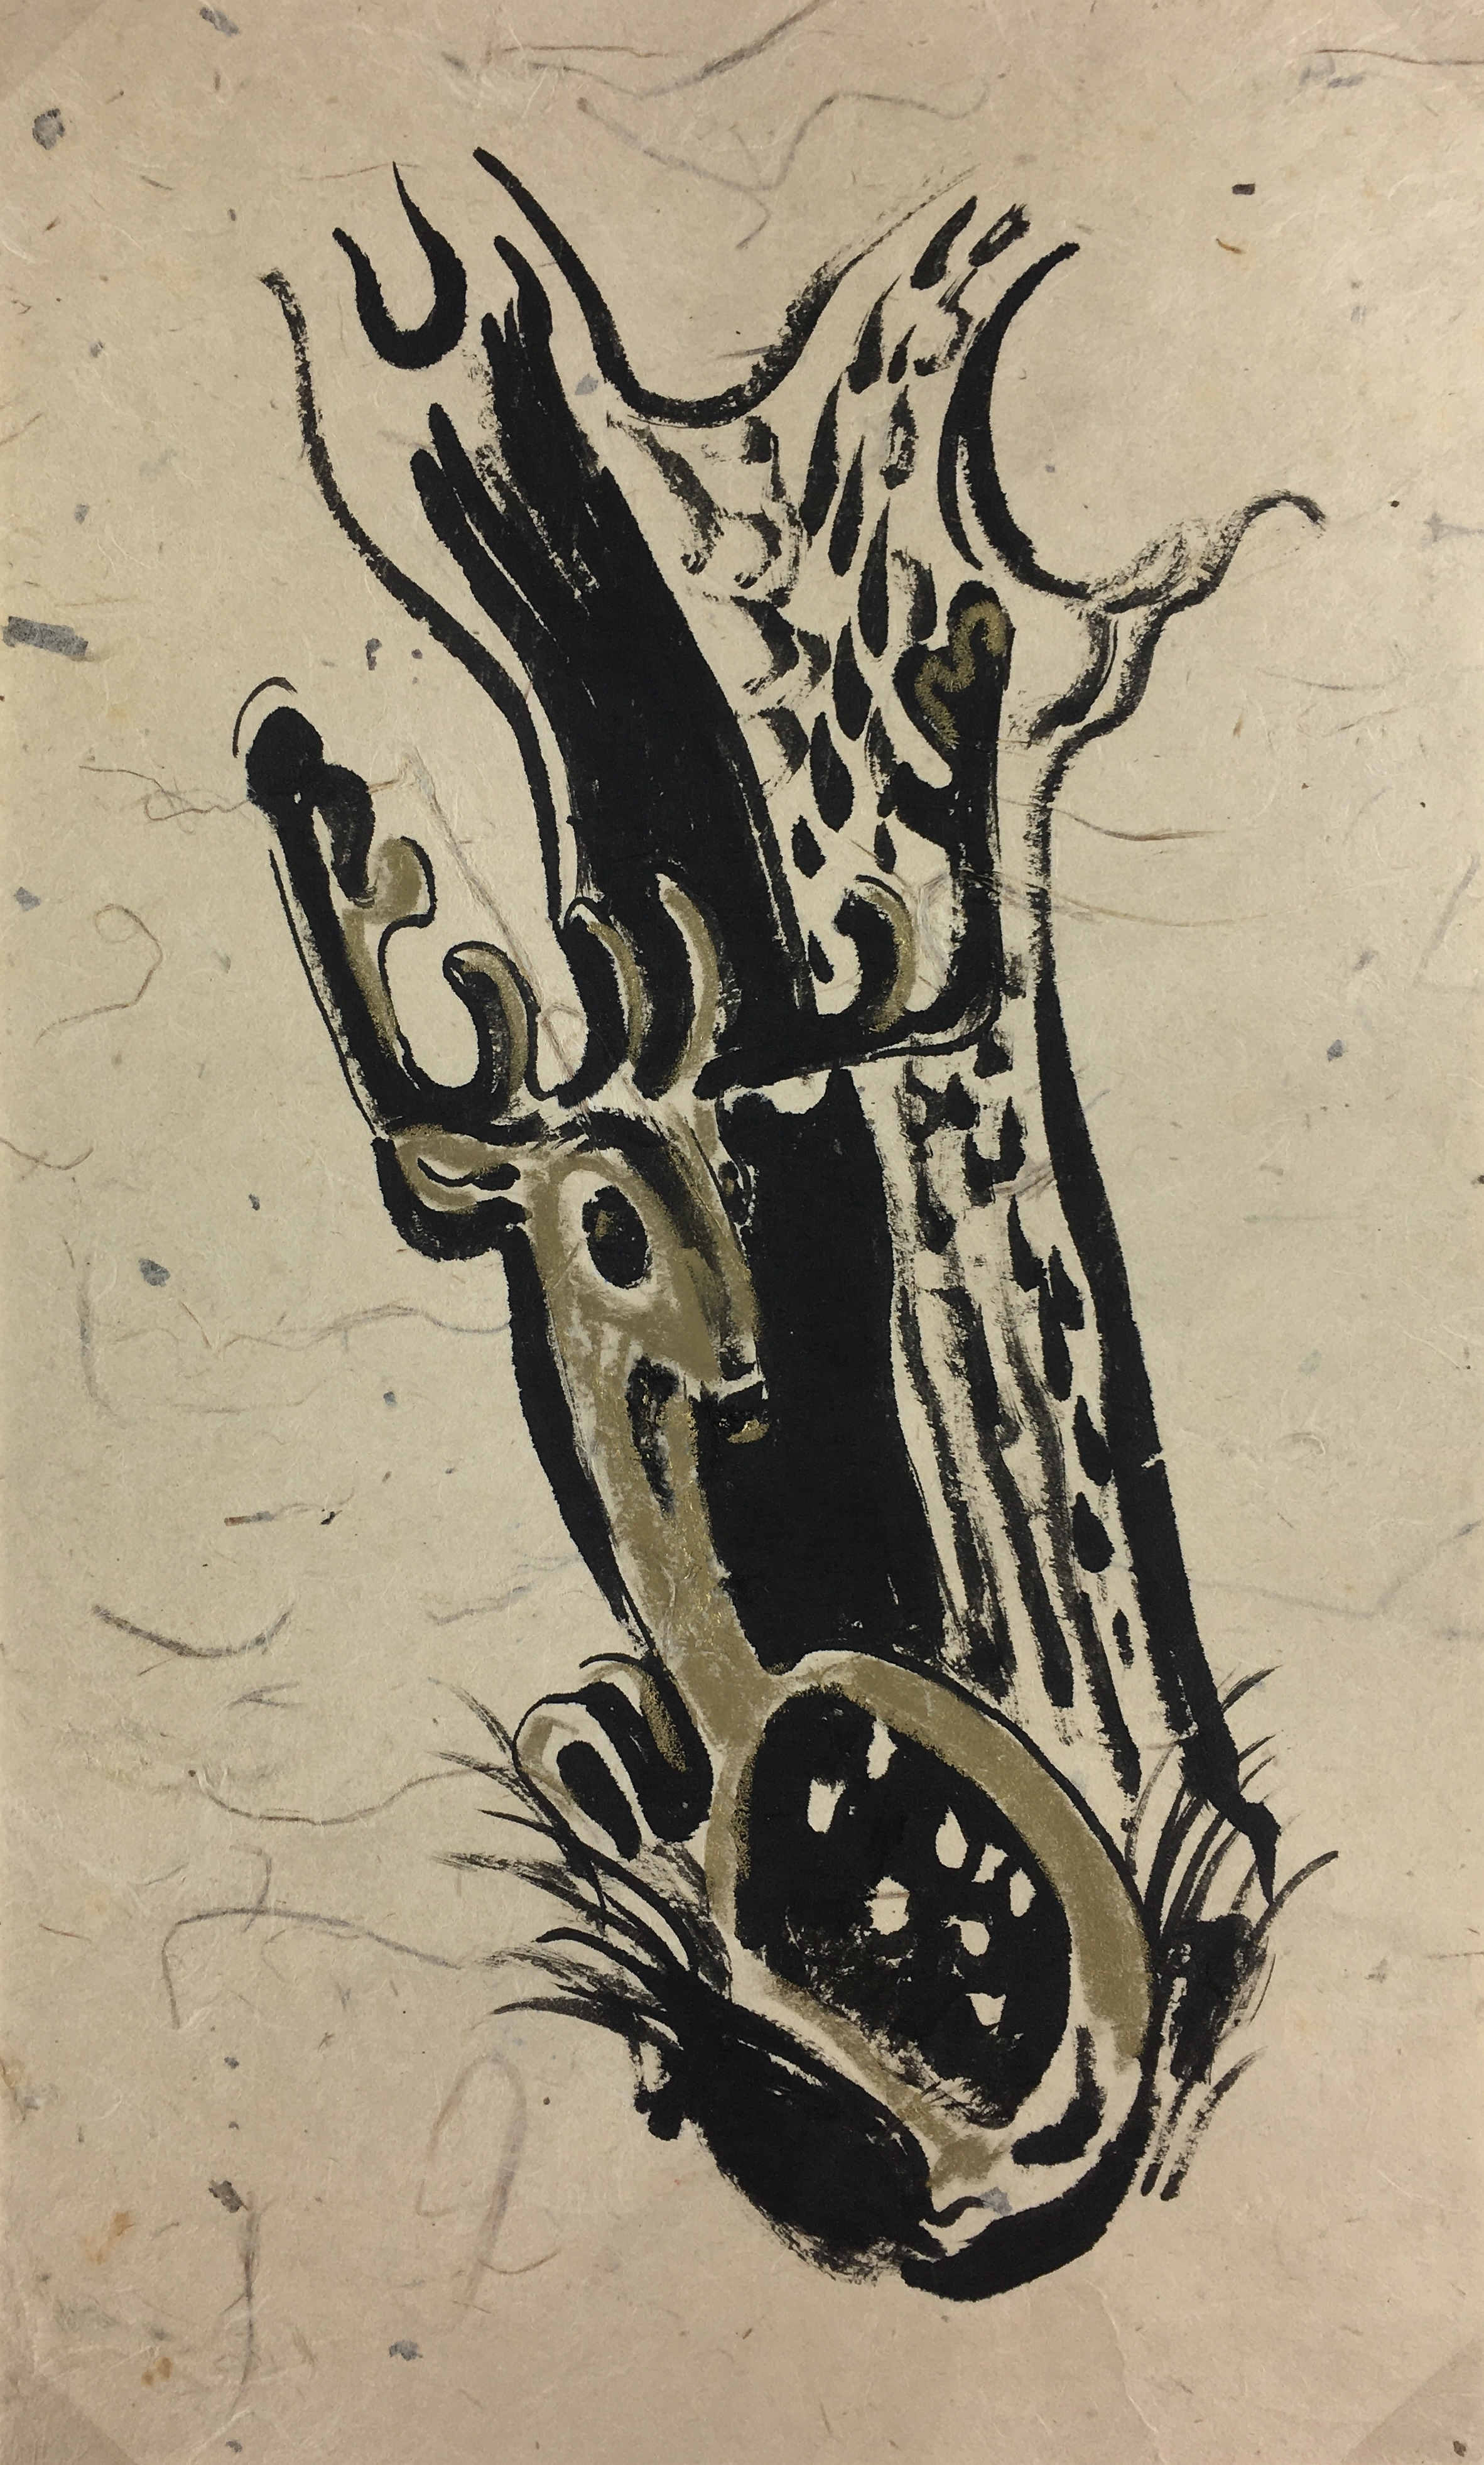 Animals Original Art - Abstract Deer, Wulfarht, c.1950